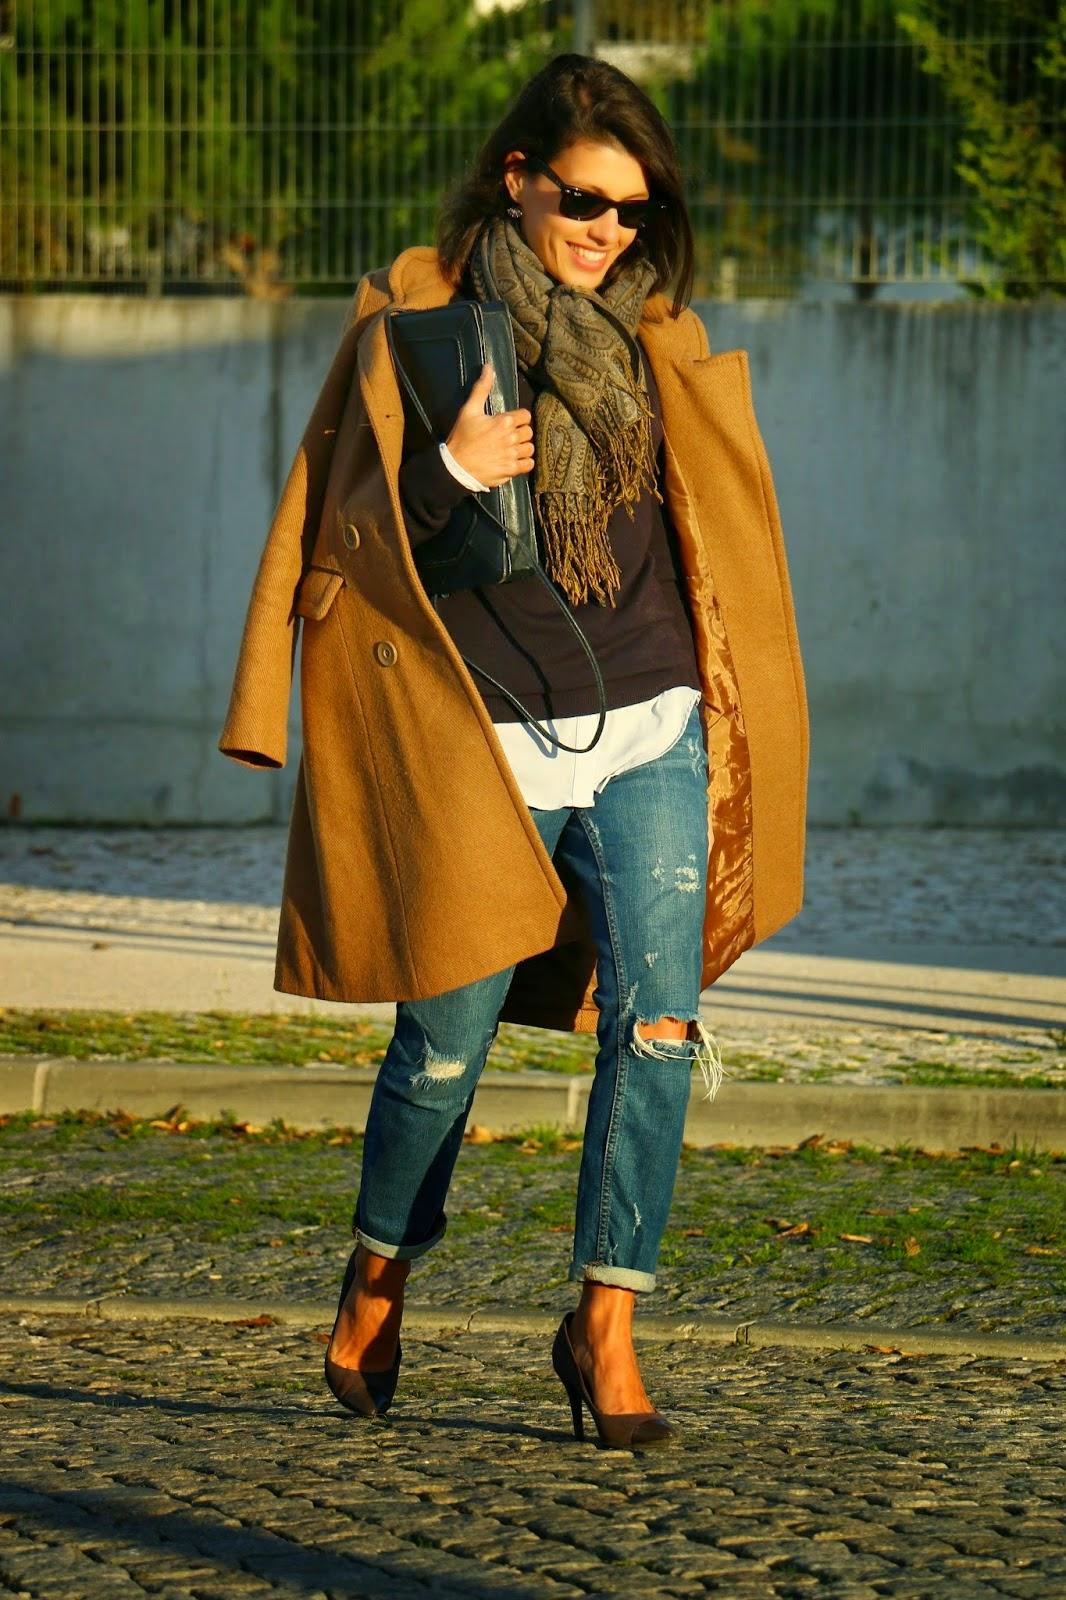 http://ilovefitametrica.blogspot.pt/2014/12/camel-coat.html#more